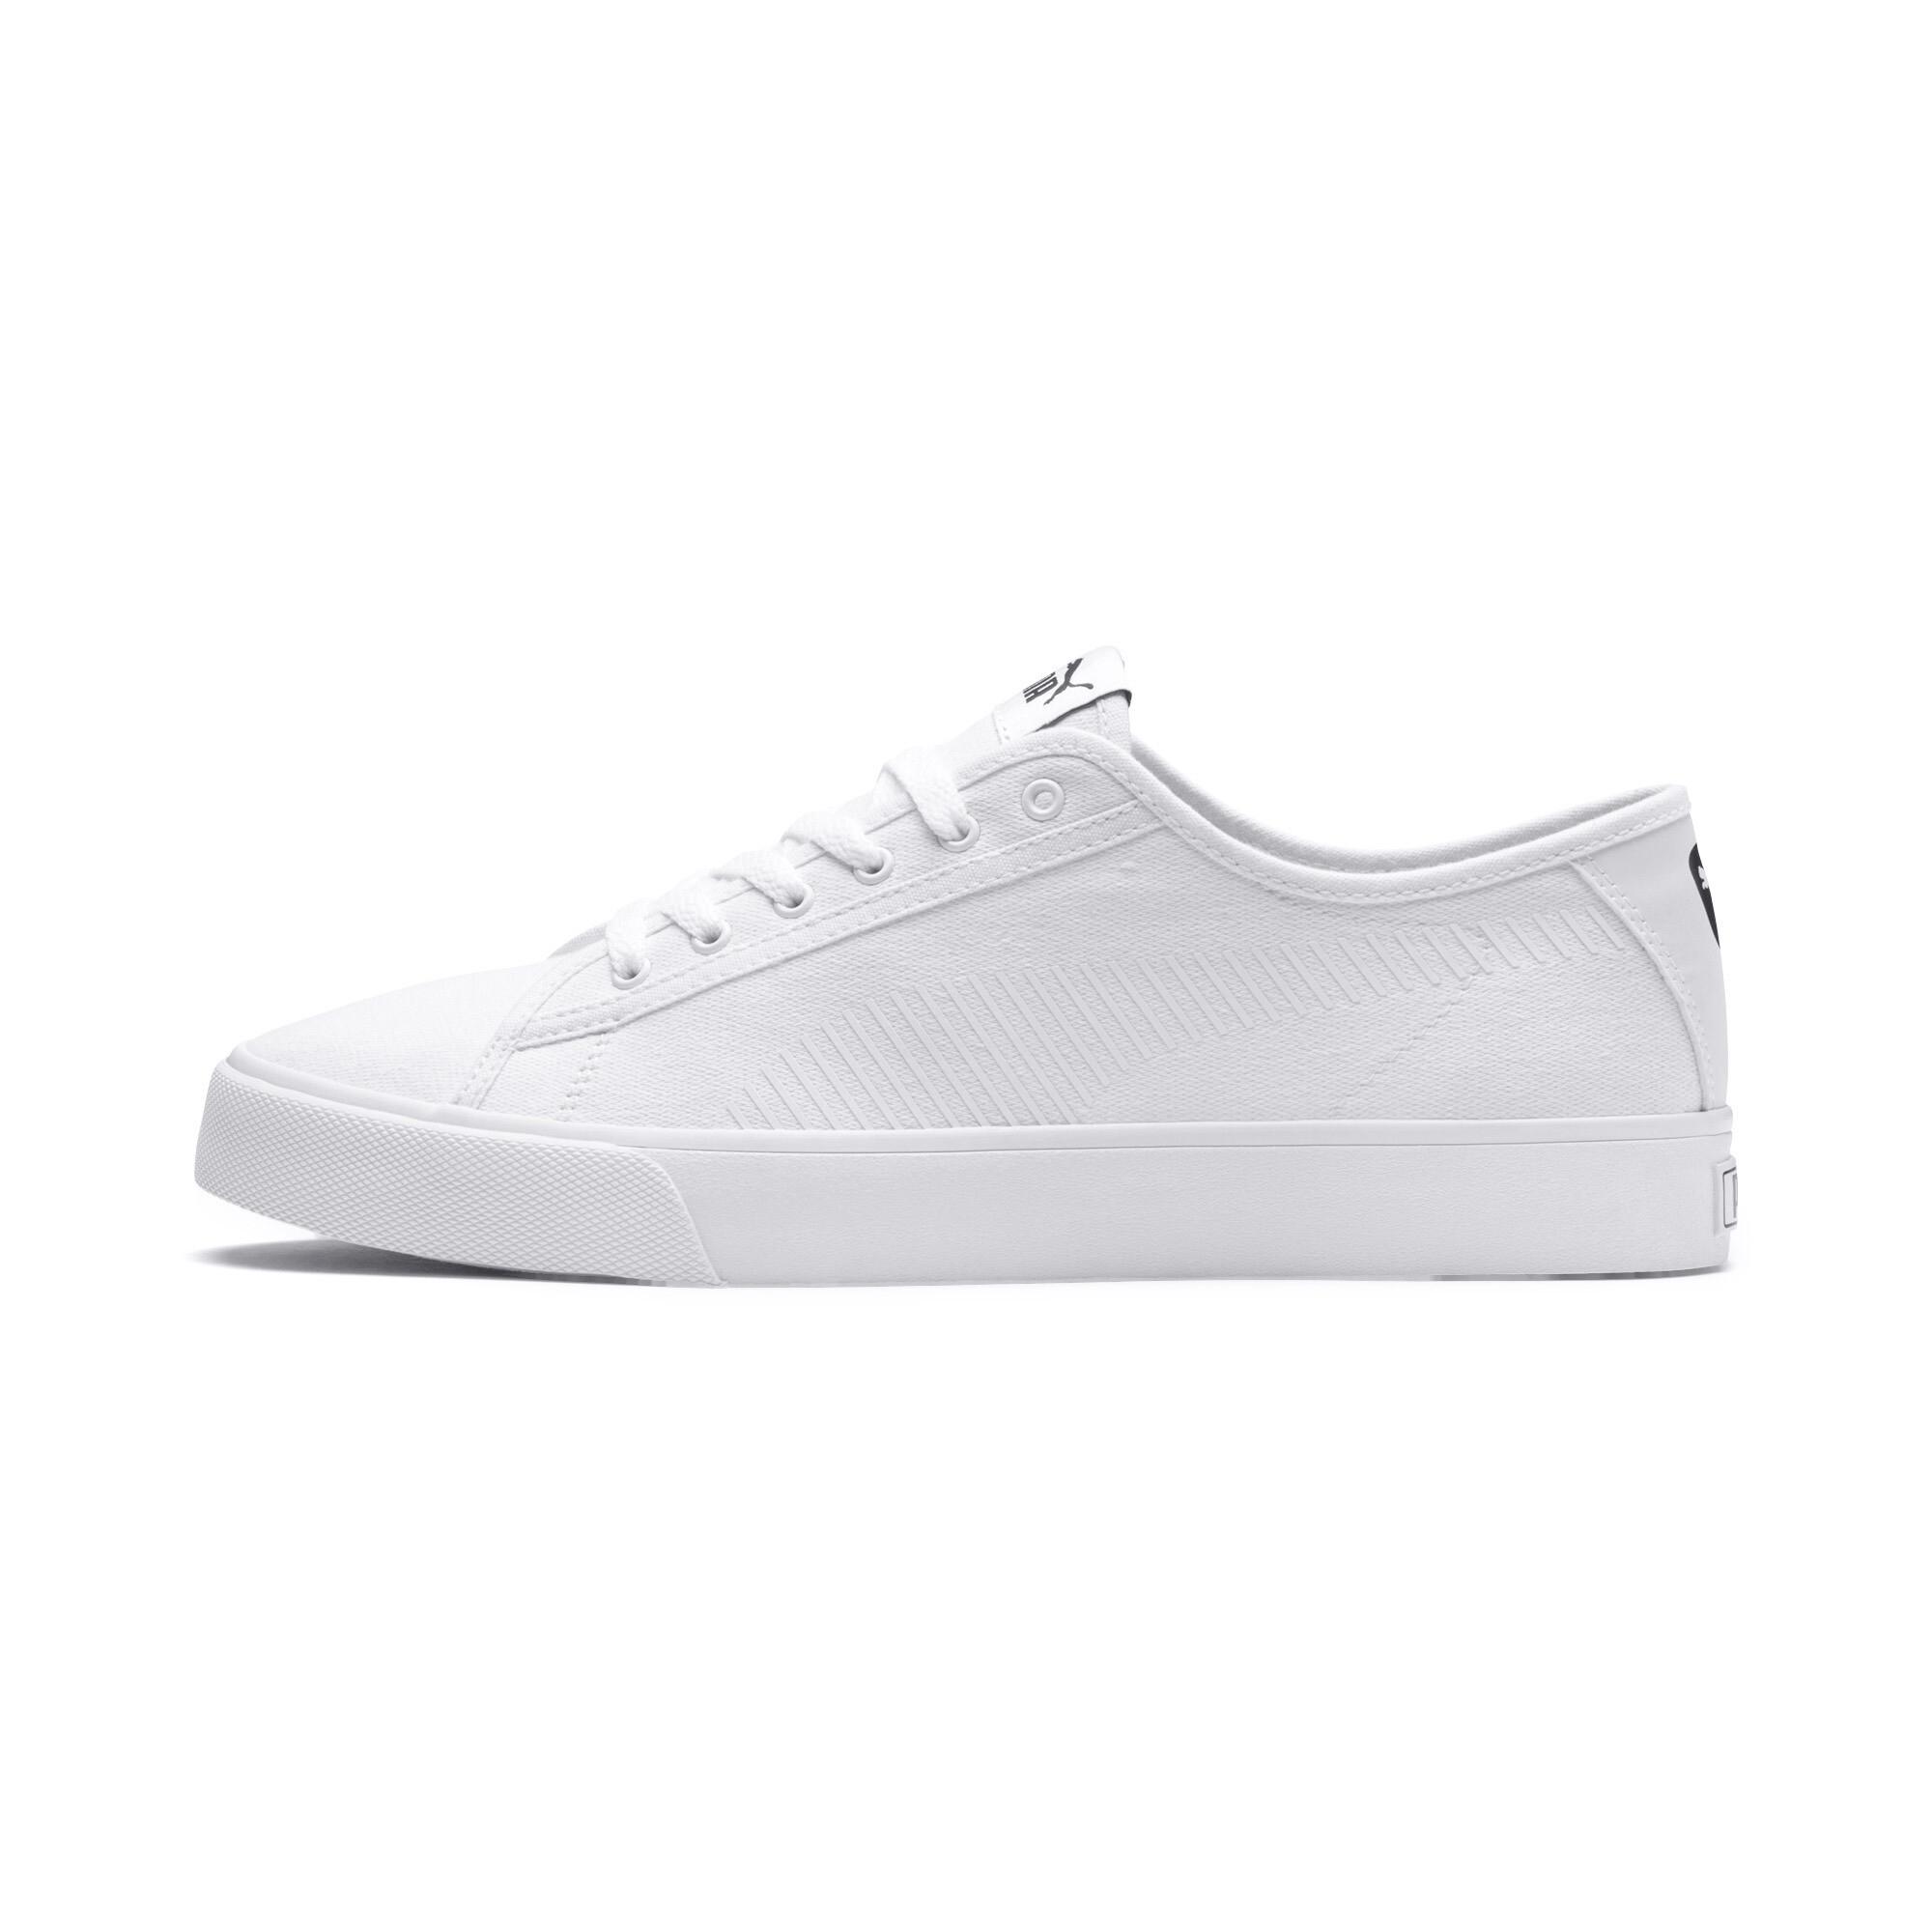 PUMA-Bari-Sneakers-Men-Shoe-Basics thumbnail 12